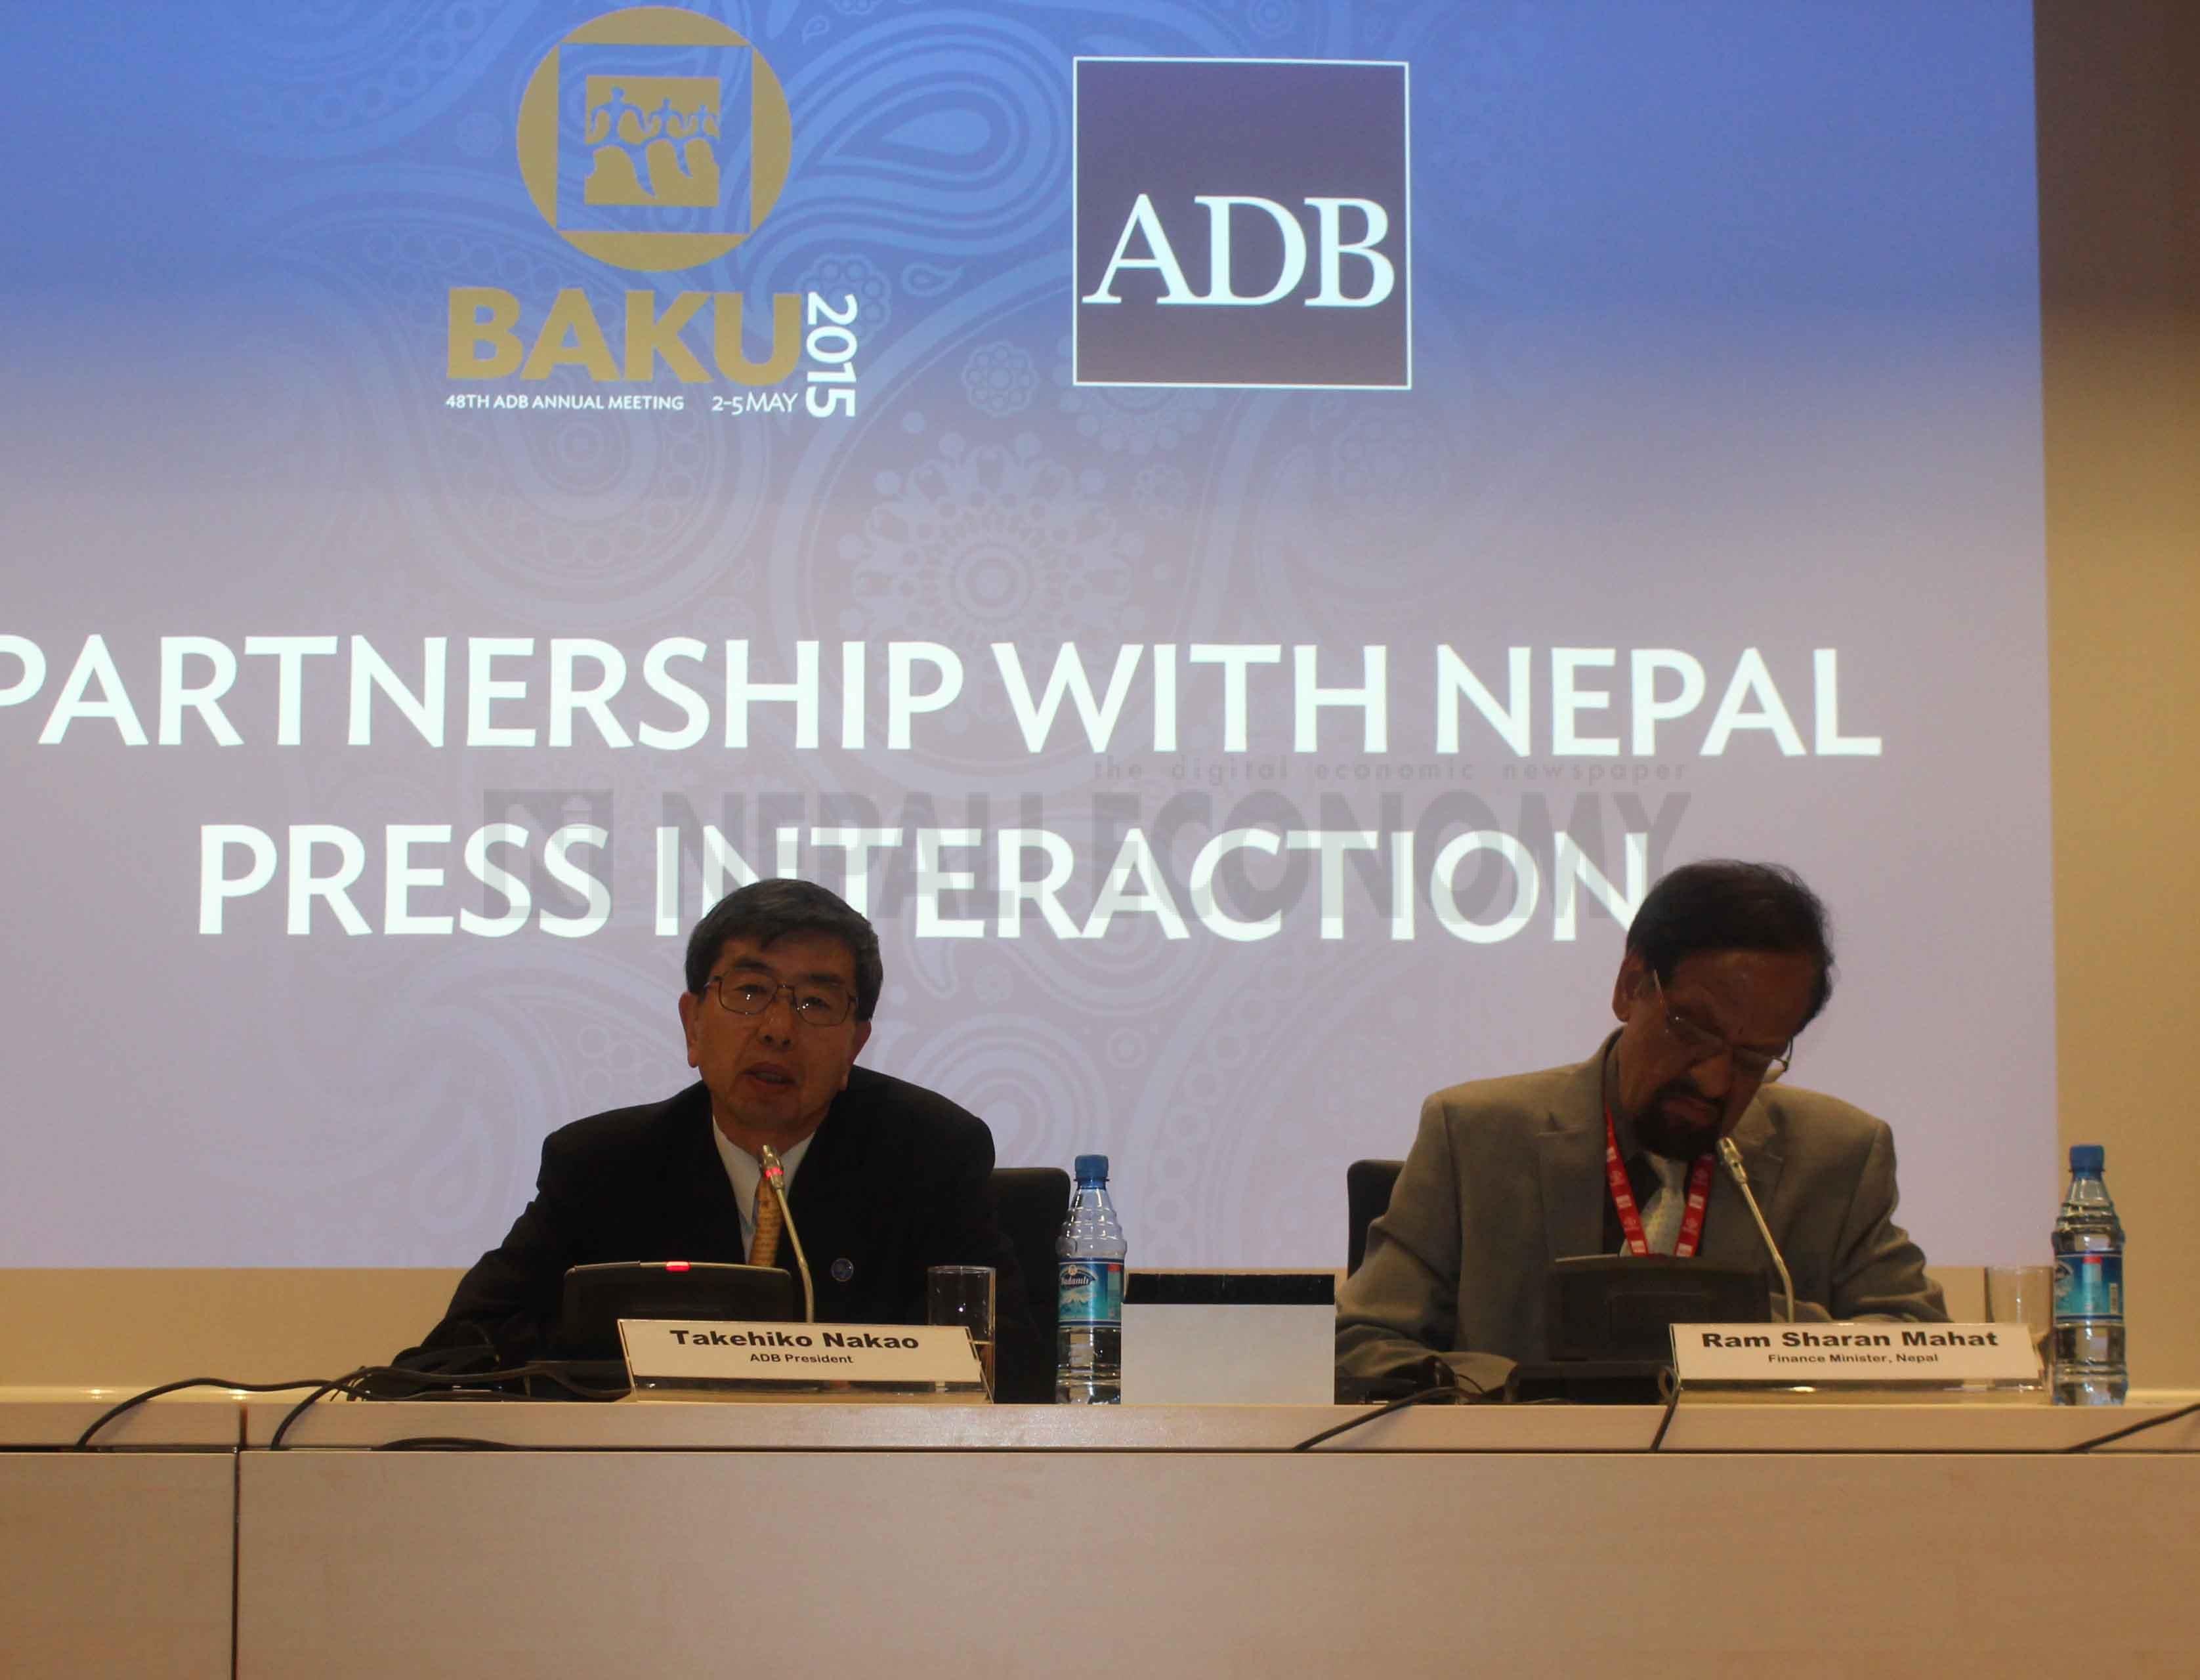 ADB hosts Partnership Forum for Nepal, Mahat presents bleak economic picture